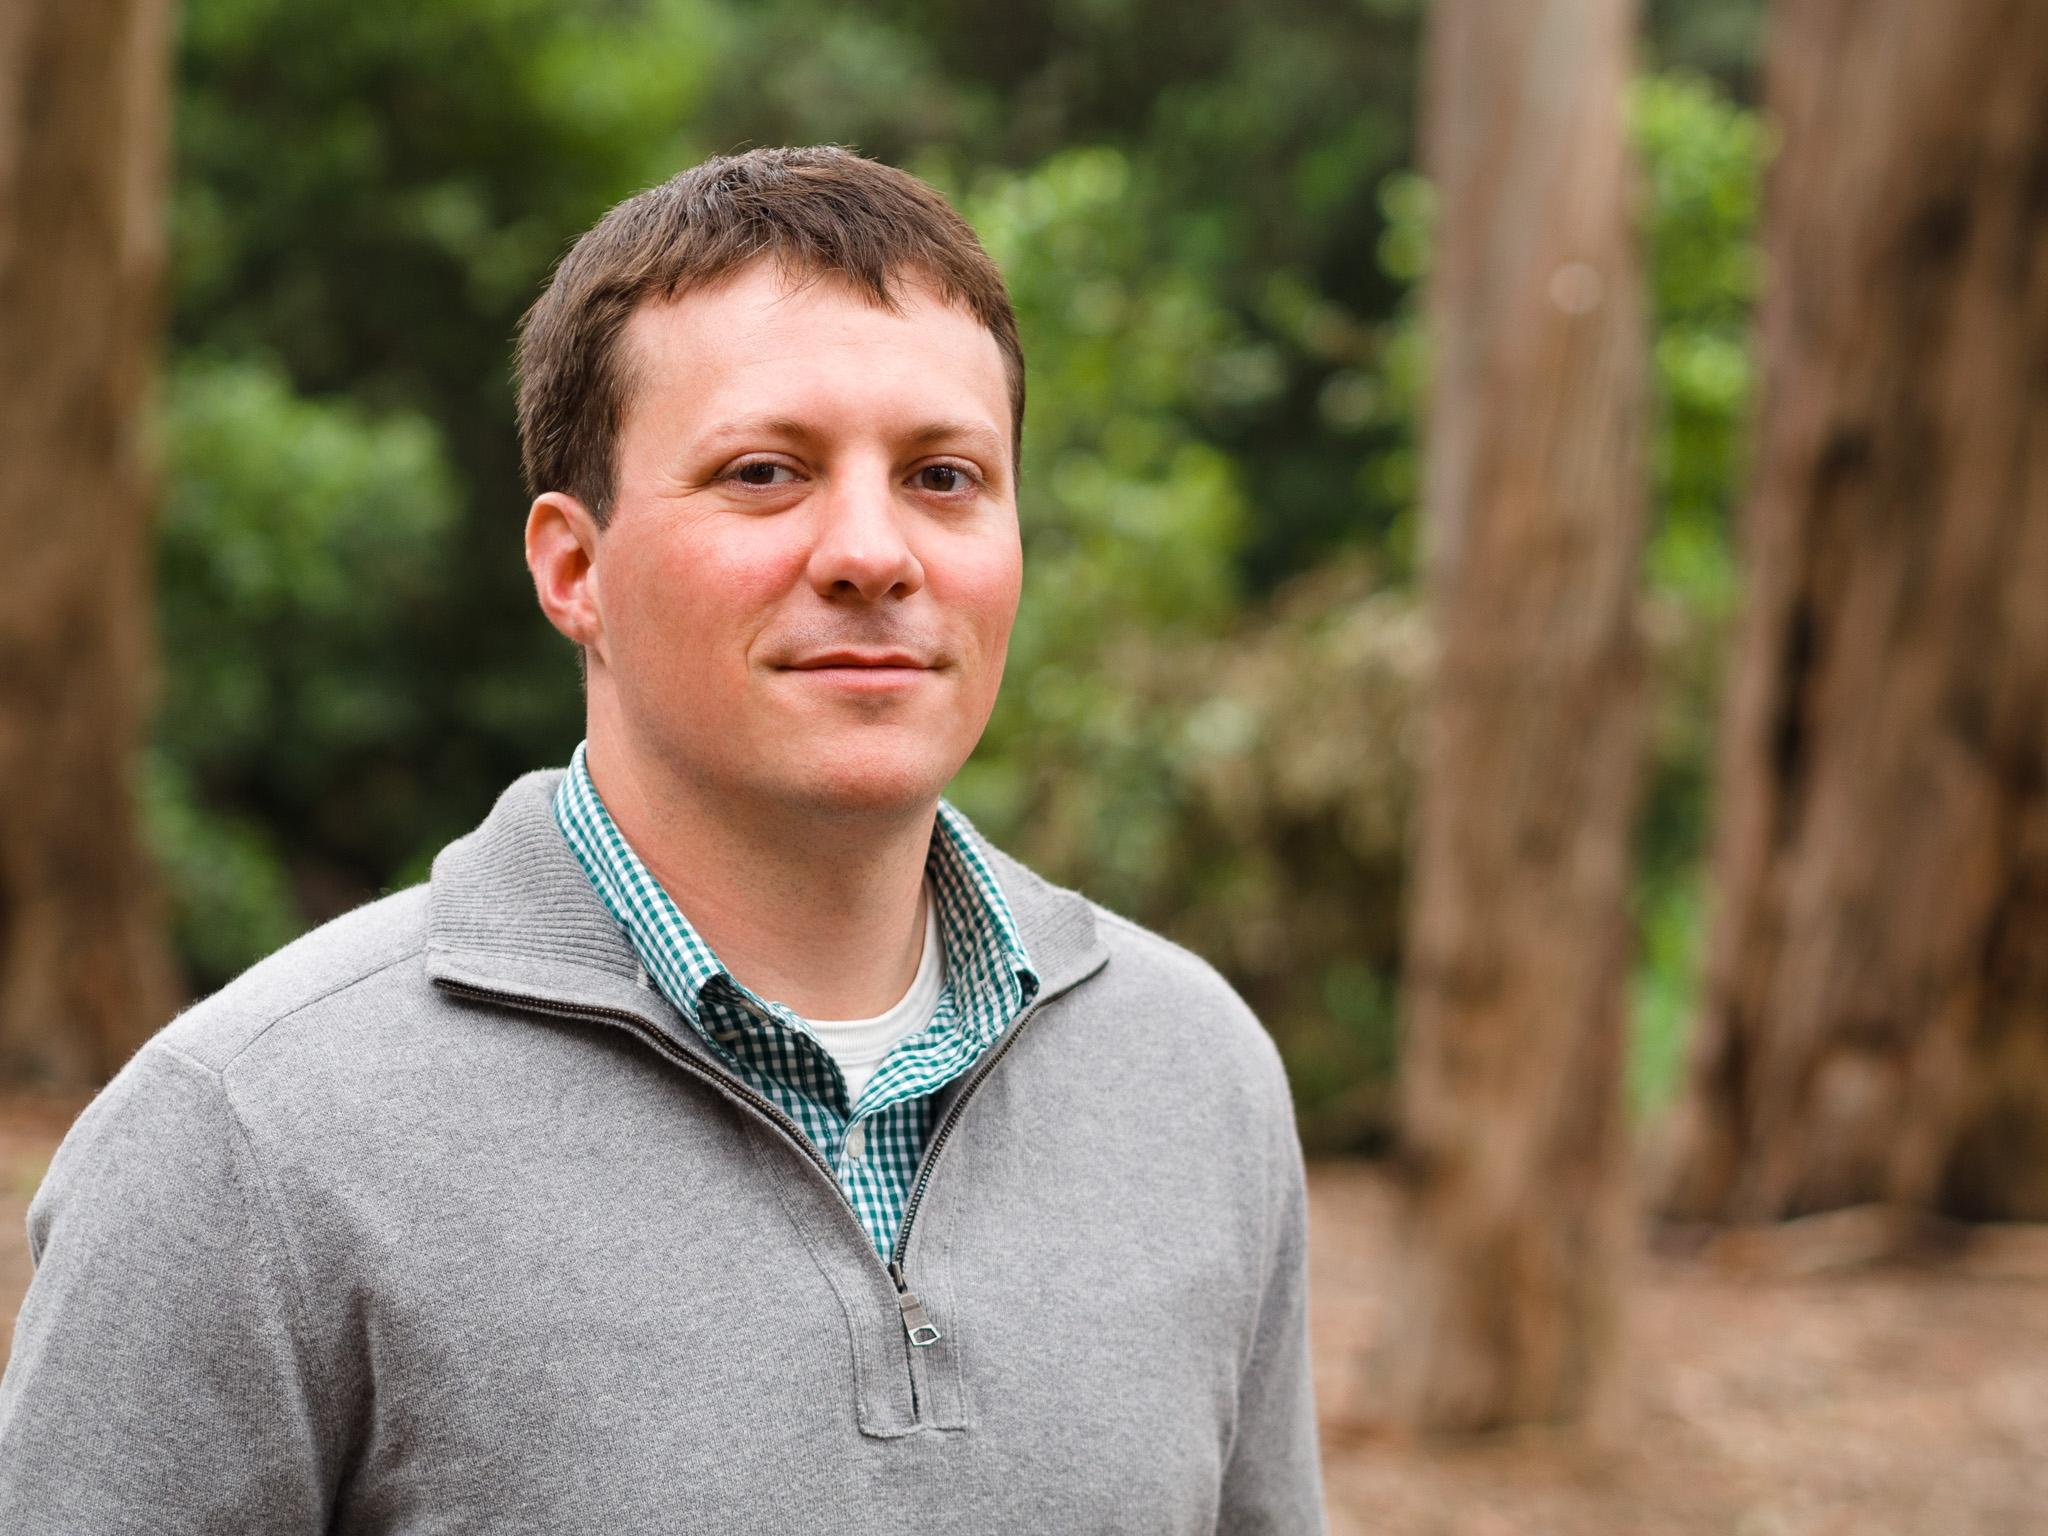 Steve Brohawn PhD, PI | brohawn at berkeley.edu